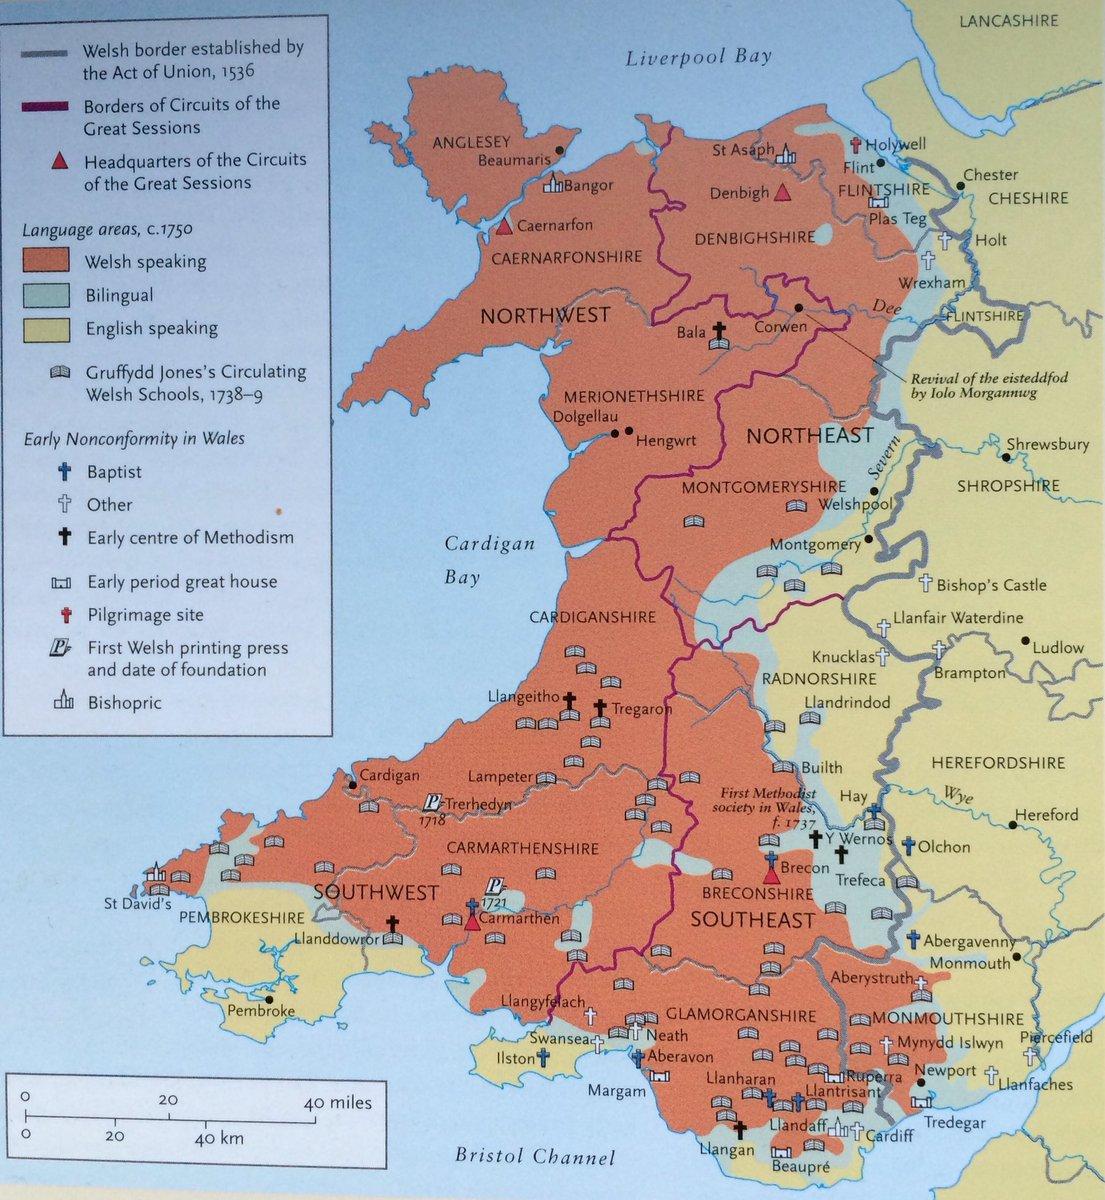 Frank Selby On Twitter Iaith Gymraeg Map Cymru Welsh - Welsh language map